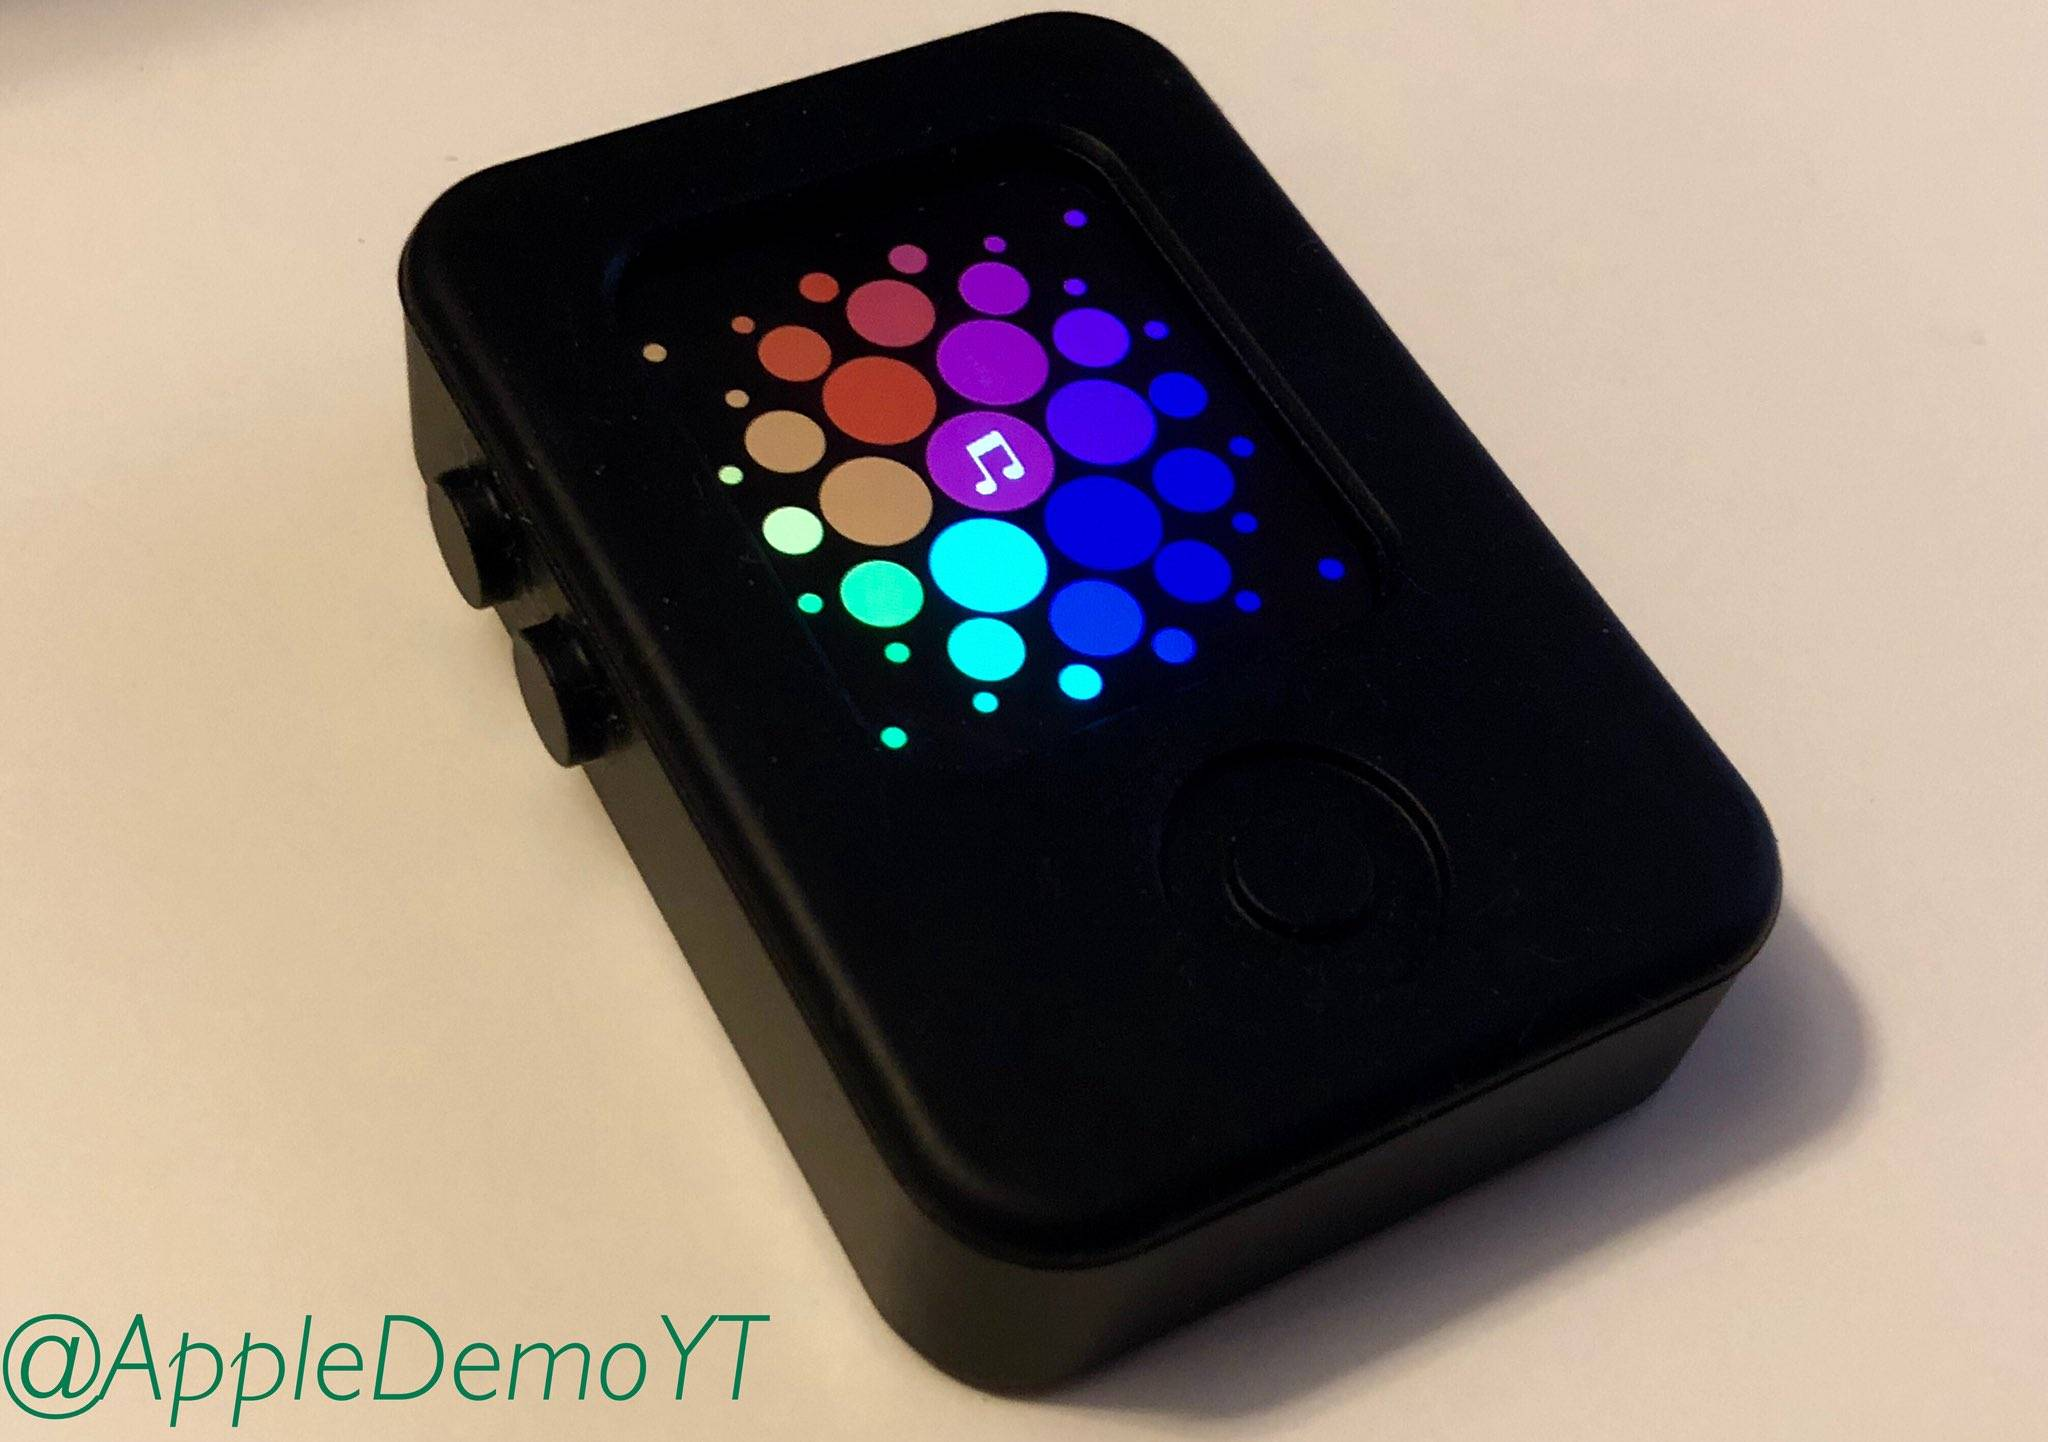 Apple Watch原型设备真实机曝光:采用矩形设计